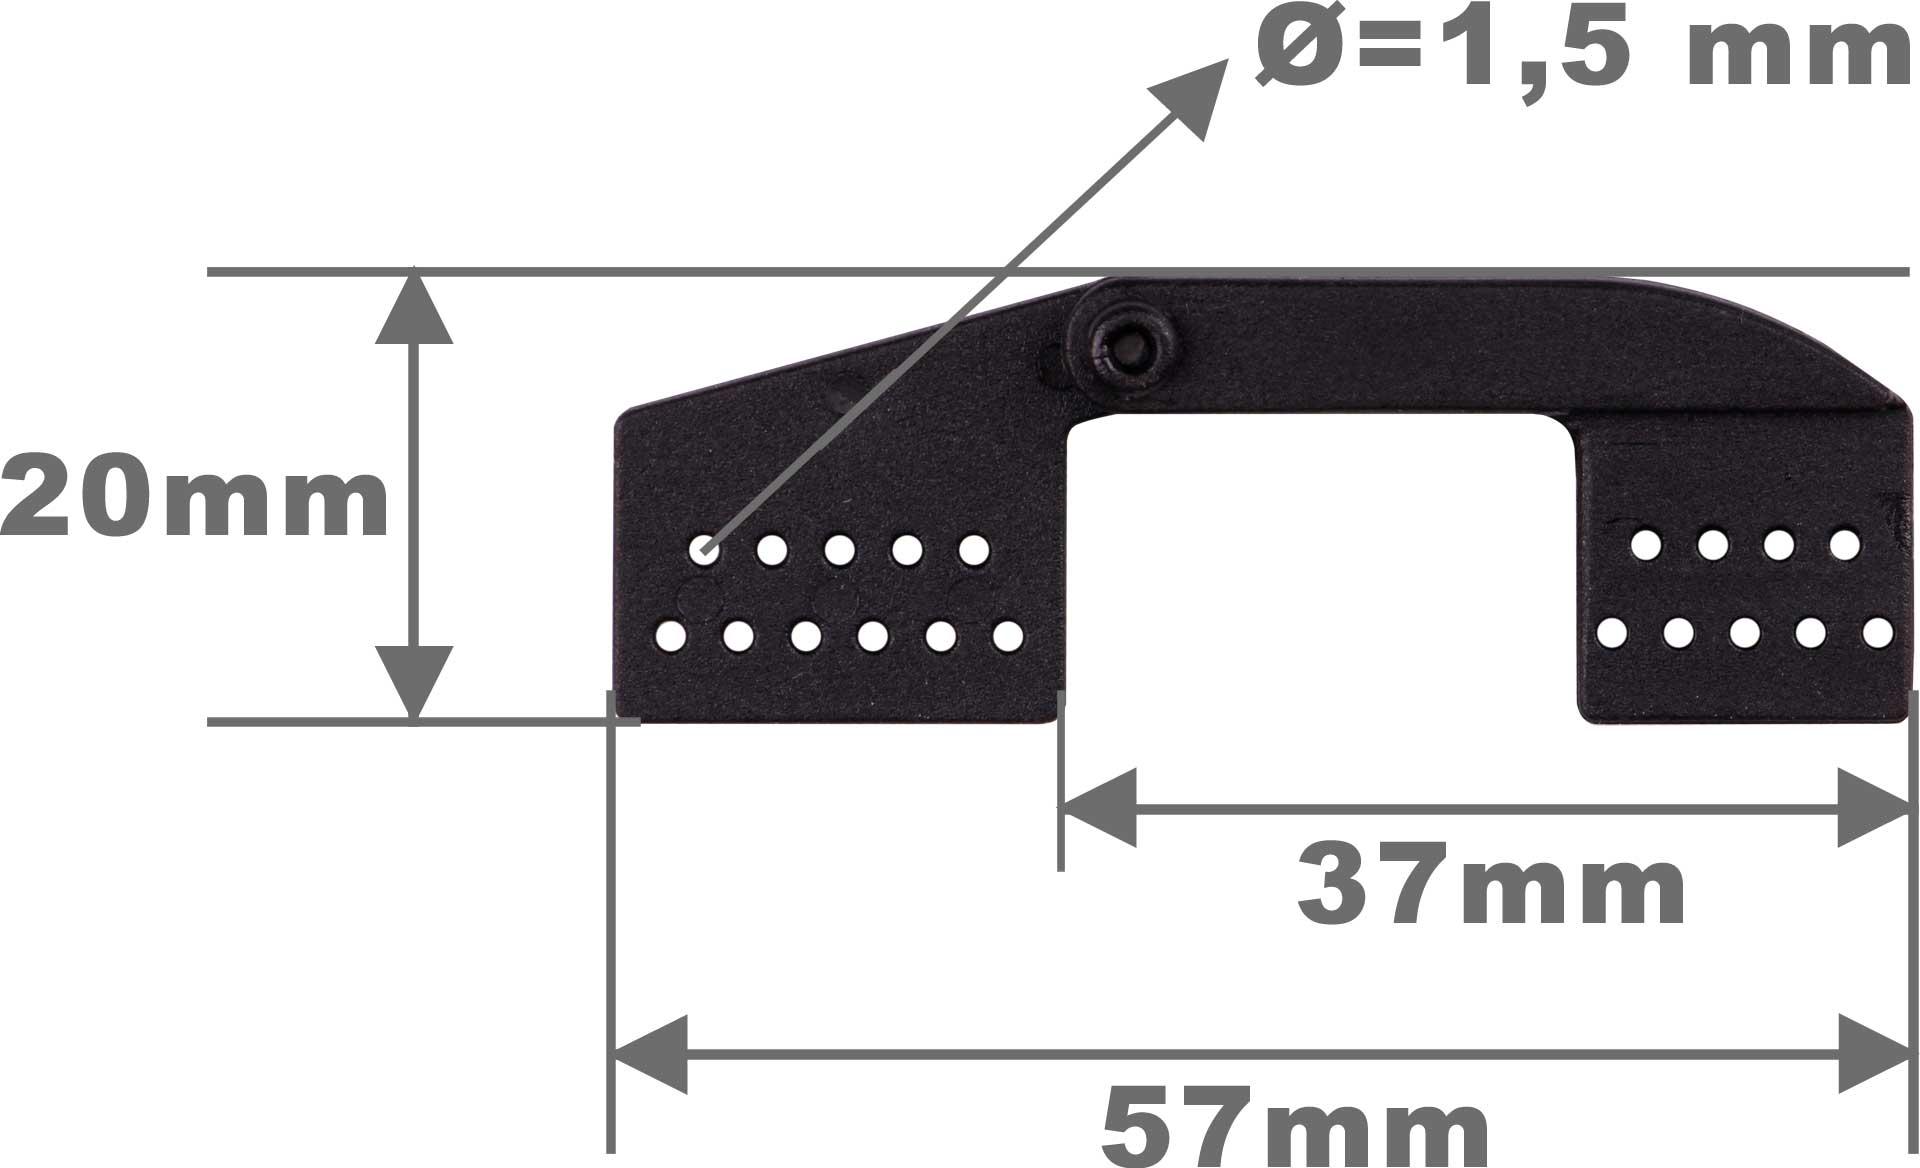 Robbe Modellsport Landeklappen-Scharnier L57mm schwarz Kunststoff 10Stk.